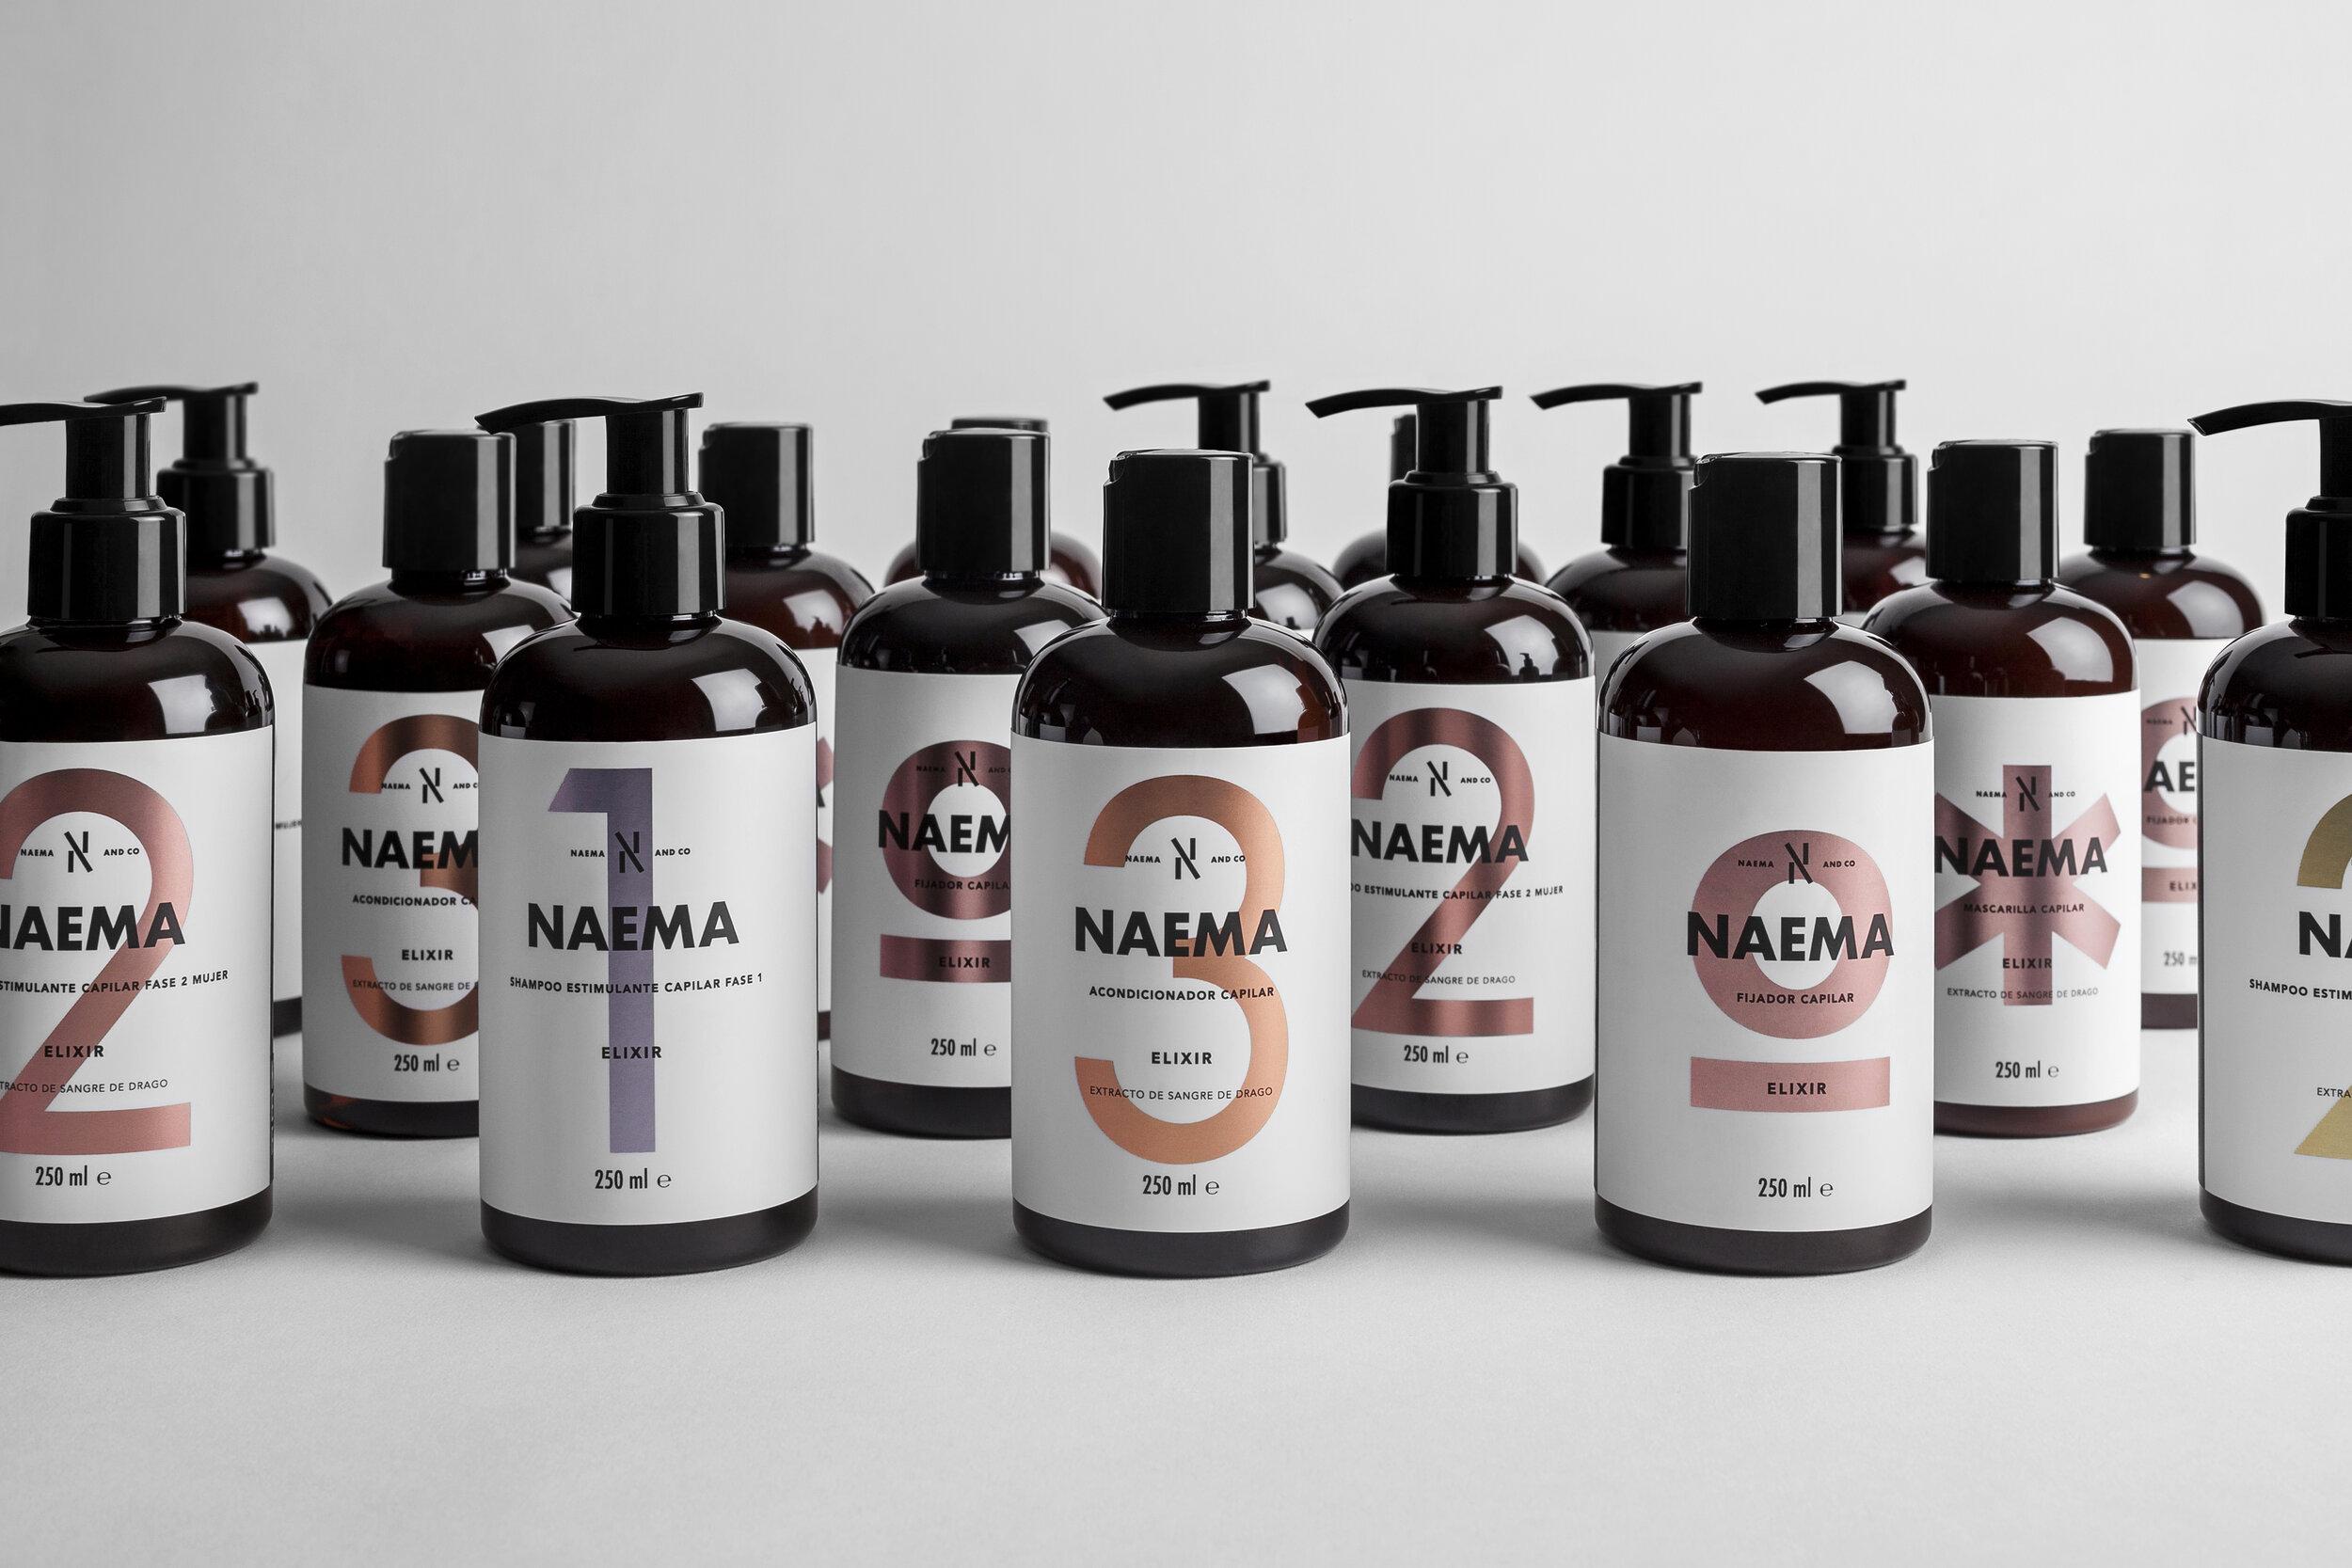 Naema by LAT | A Creative Company